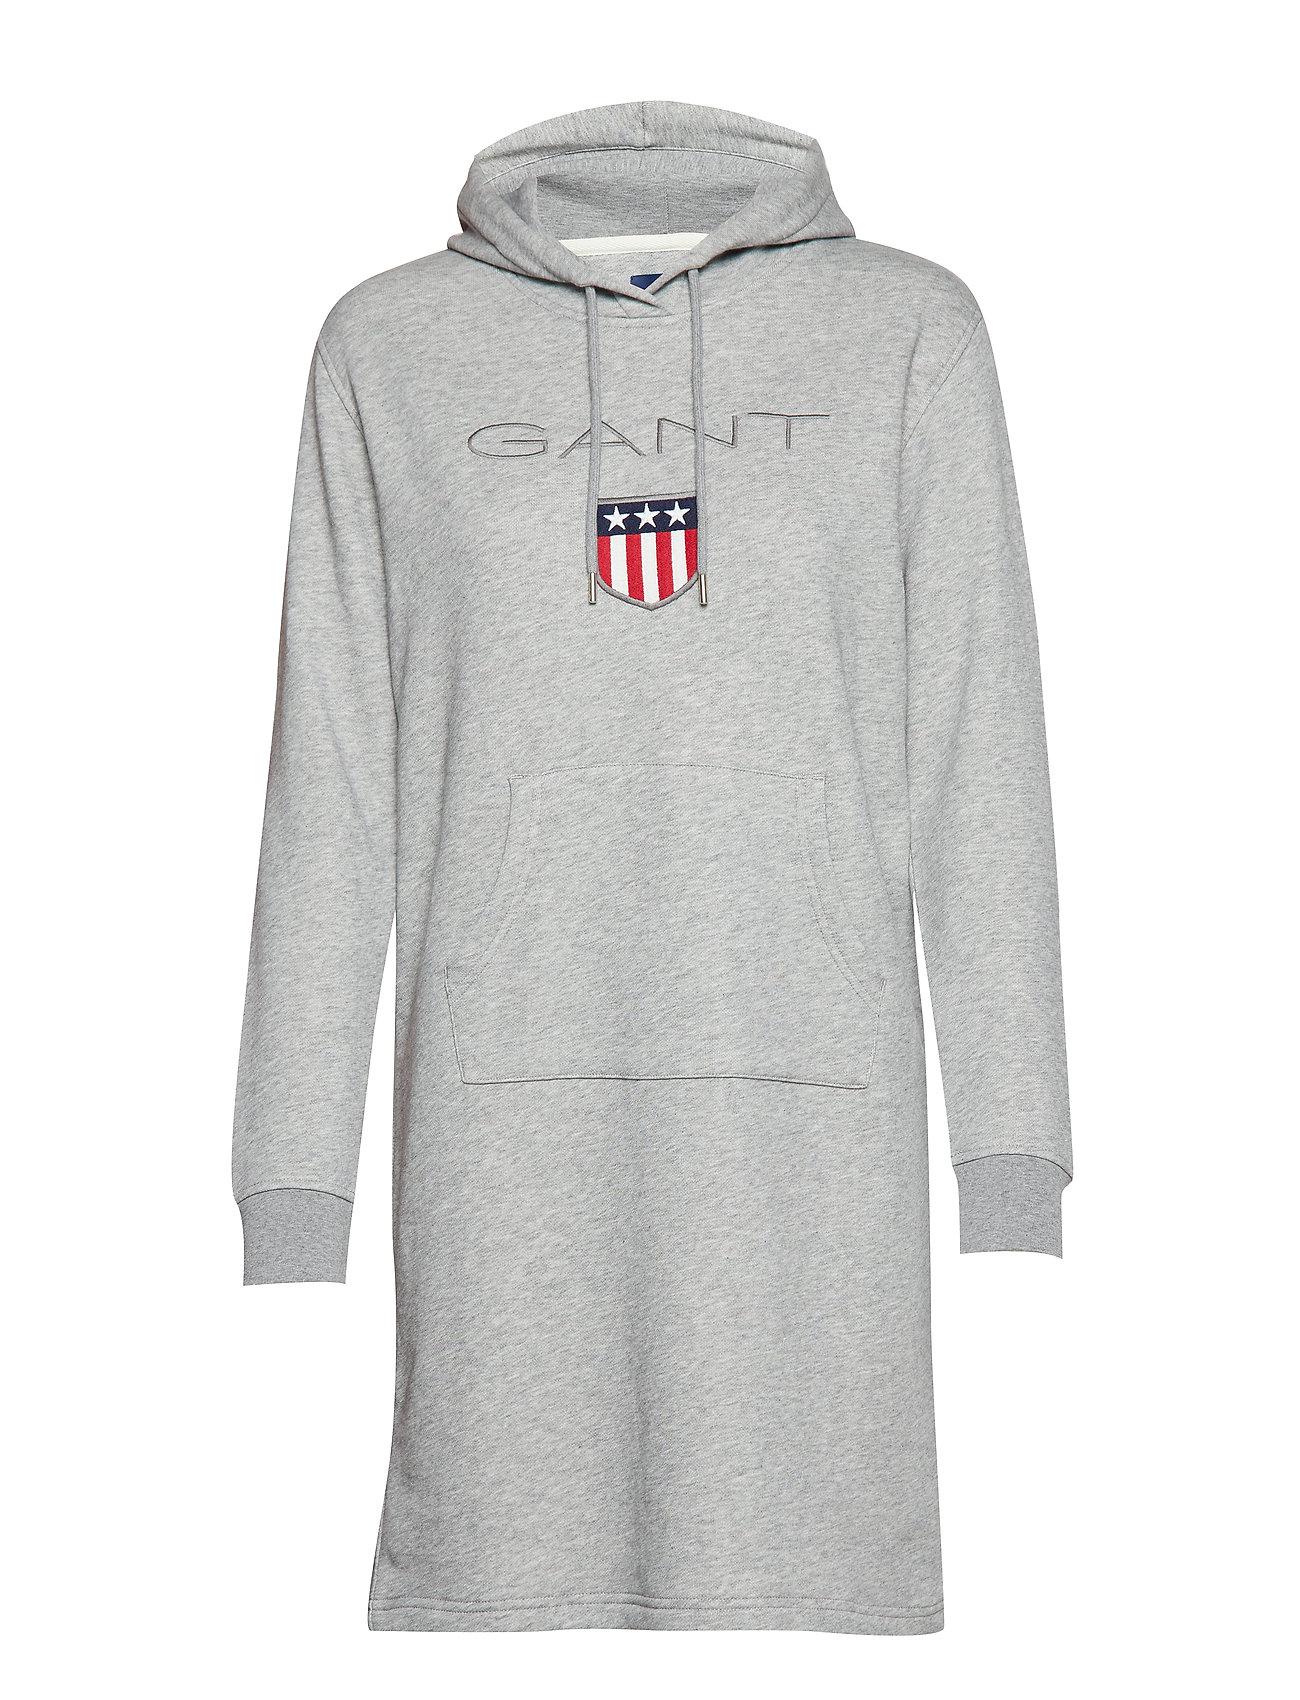 GANT O1. GANT SHIELD HODDIE DRESS